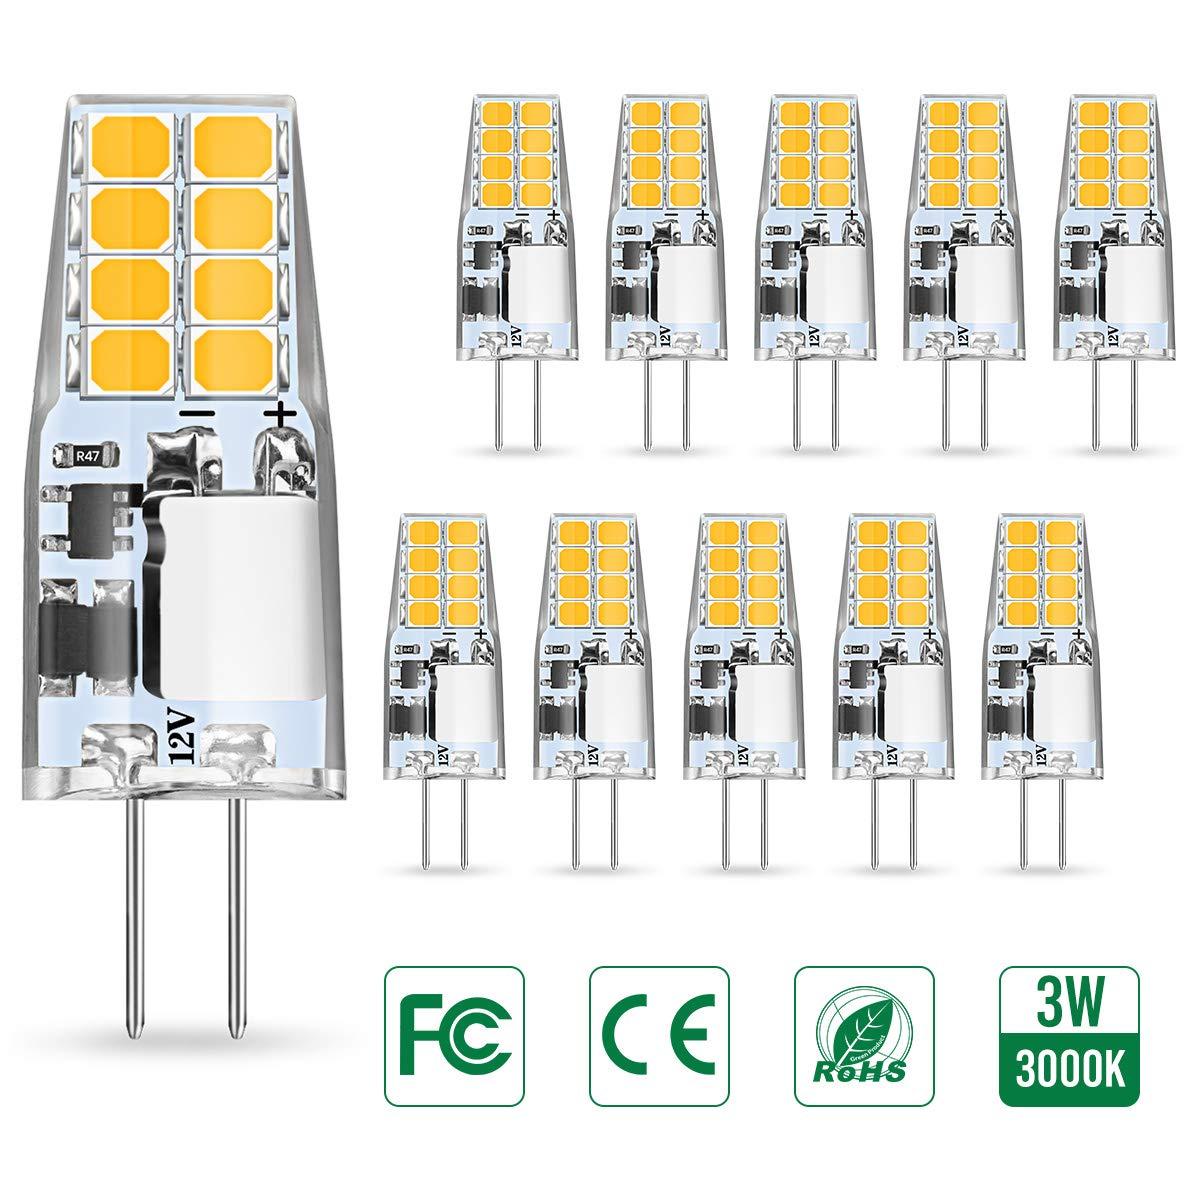 AMBOTHER G4 LED Lampen, 3W LED Birnen ersetzt 35W Halogenlampen